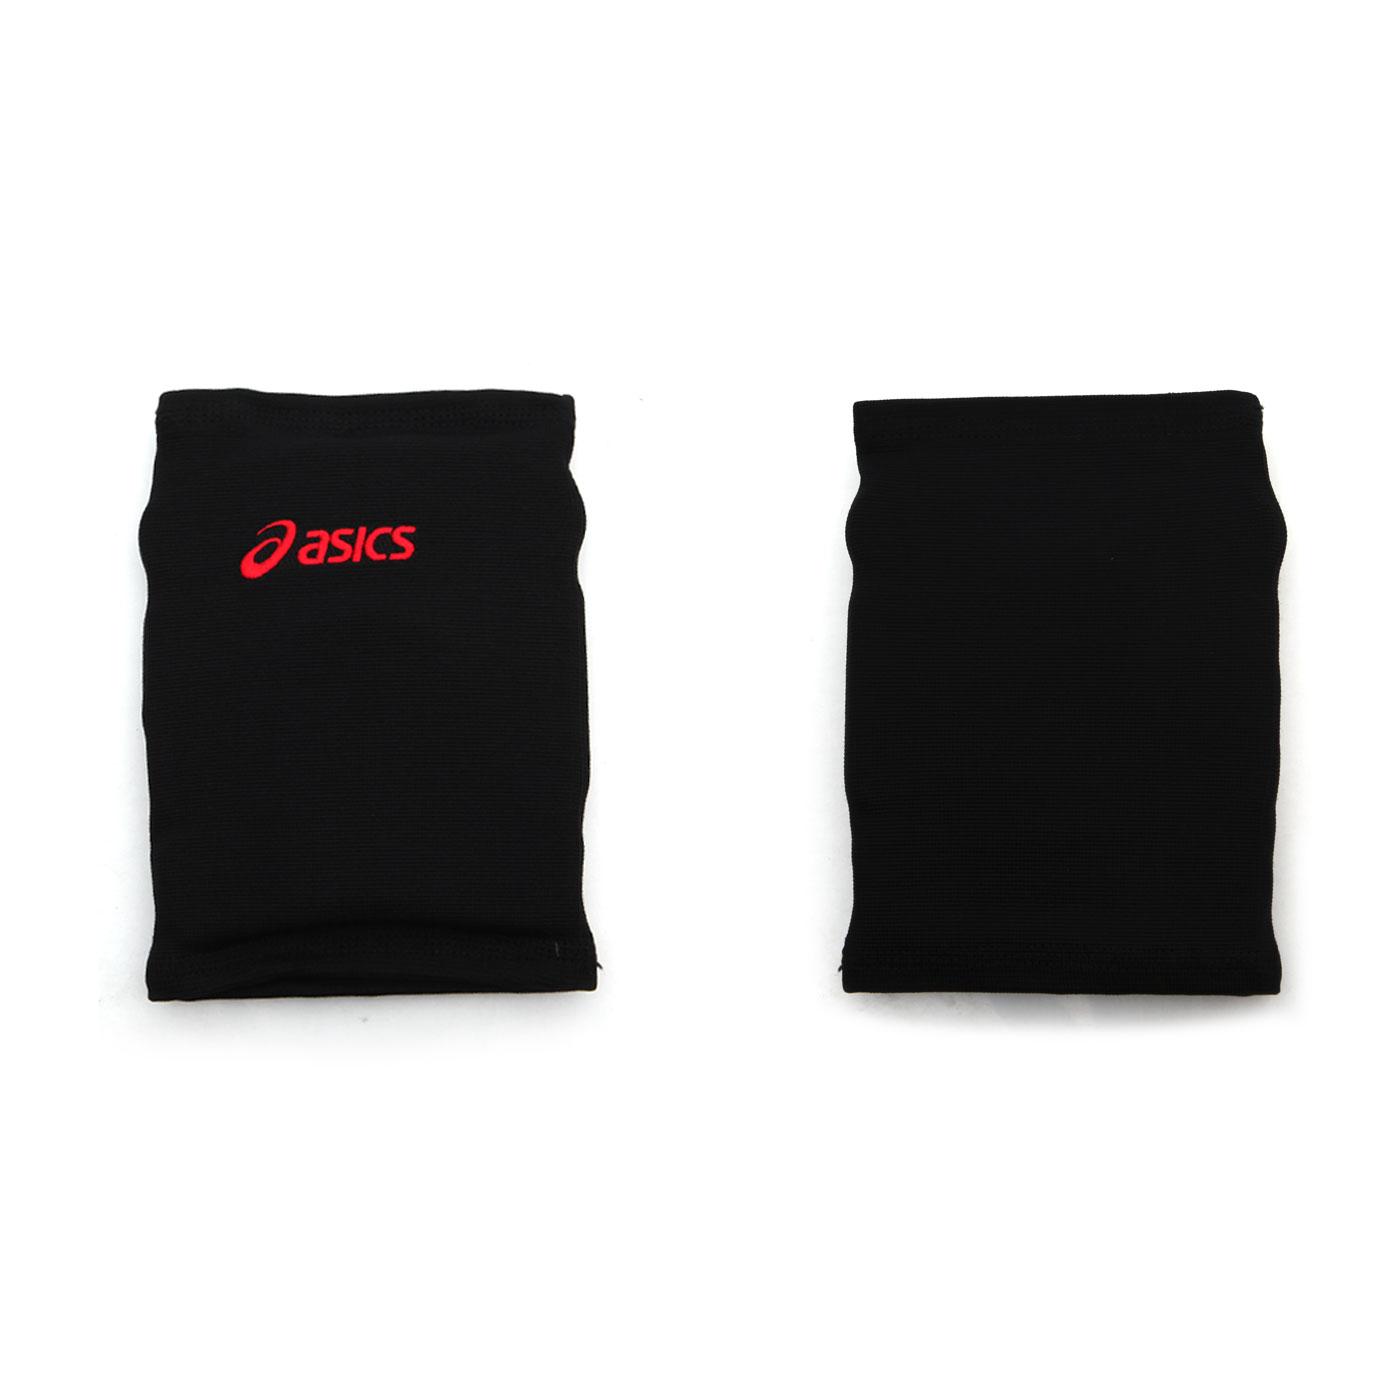 ASICS 短版泡棉護膝 Z31405-5008 - 黑紅